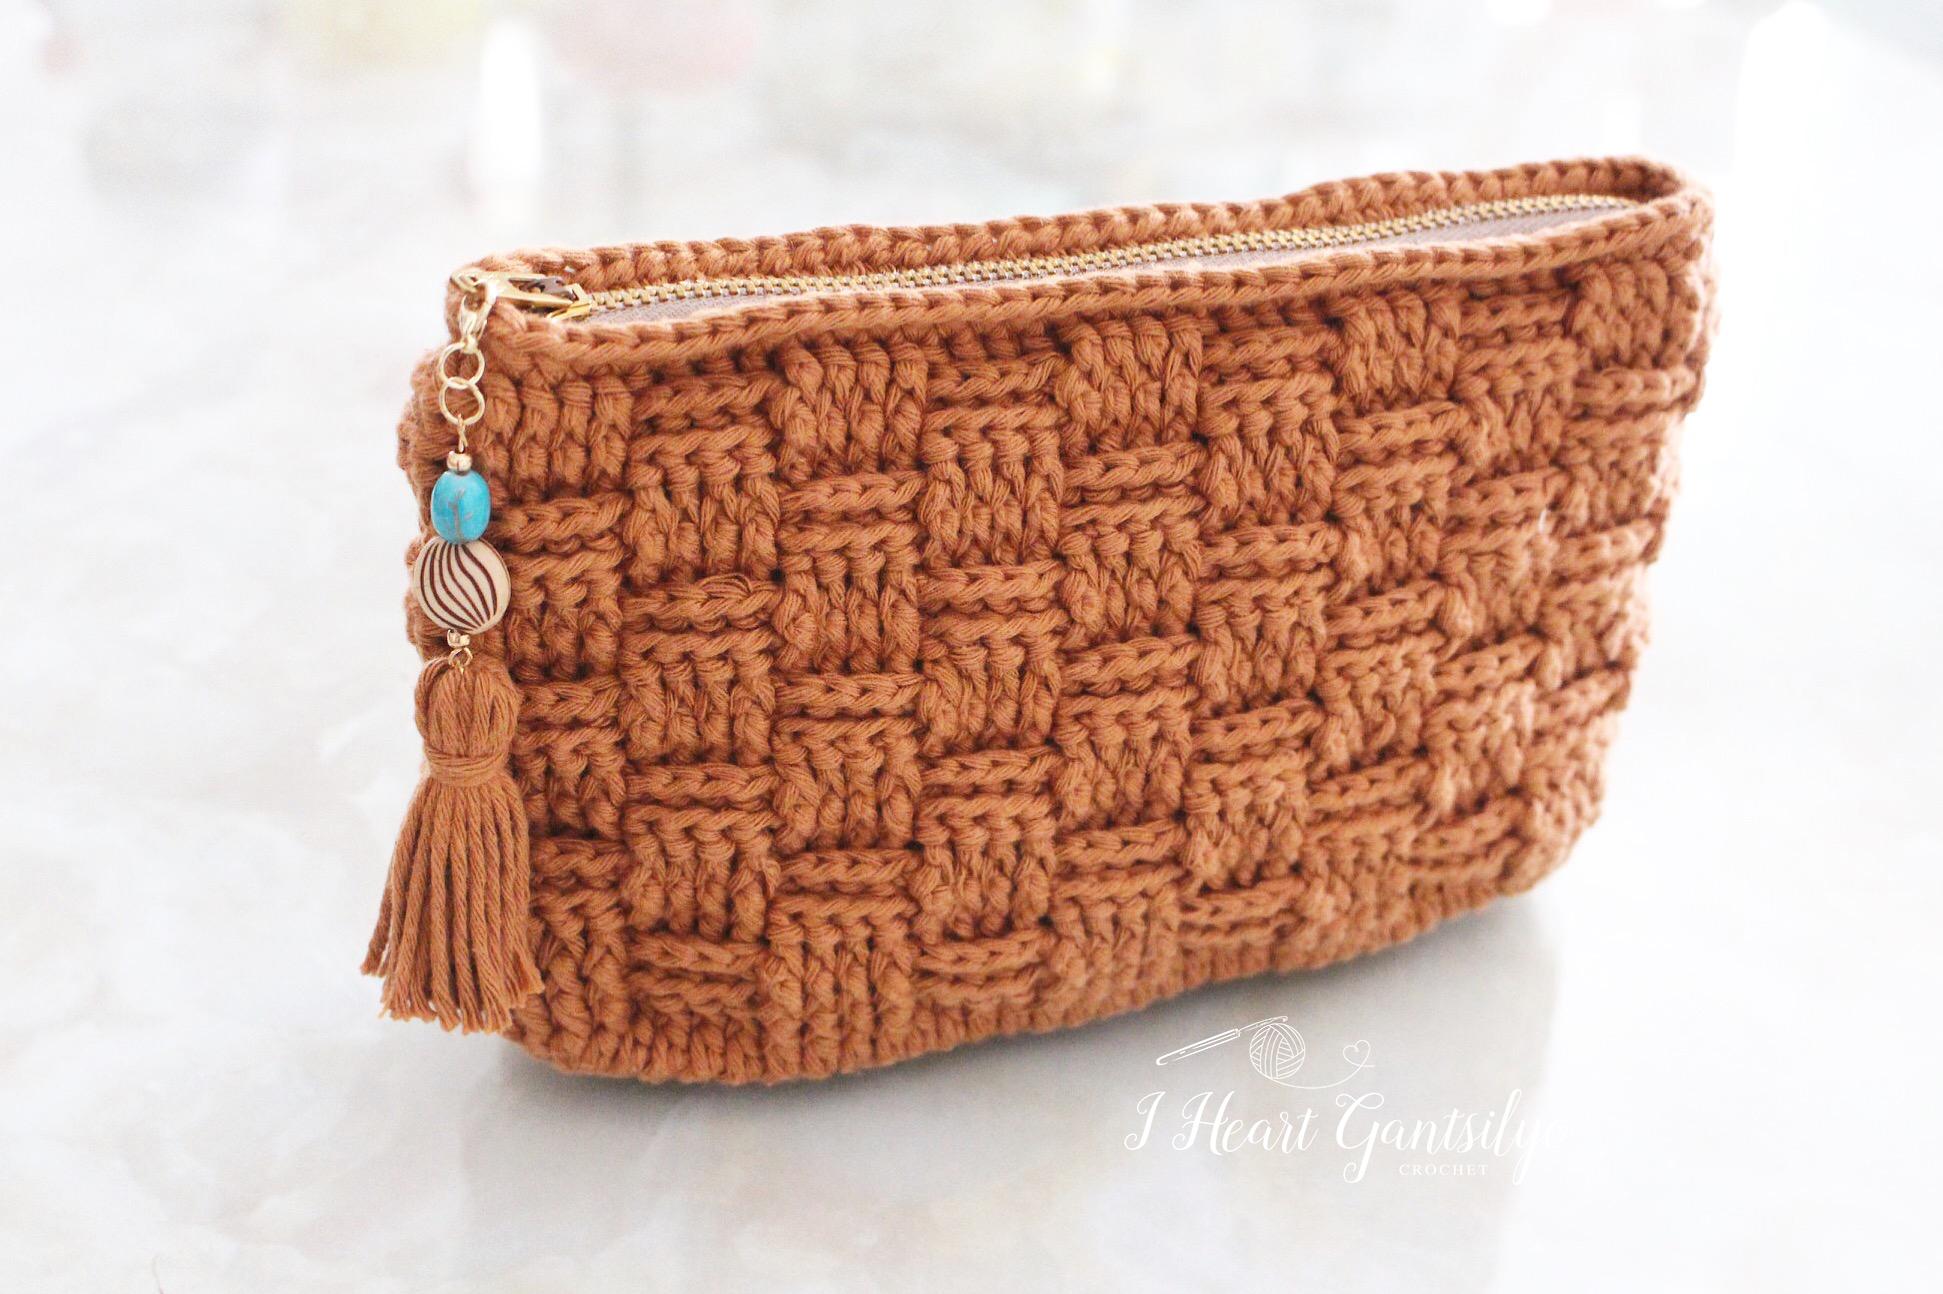 Basketweave Stitch Pouch   I Heart Gantsilyo